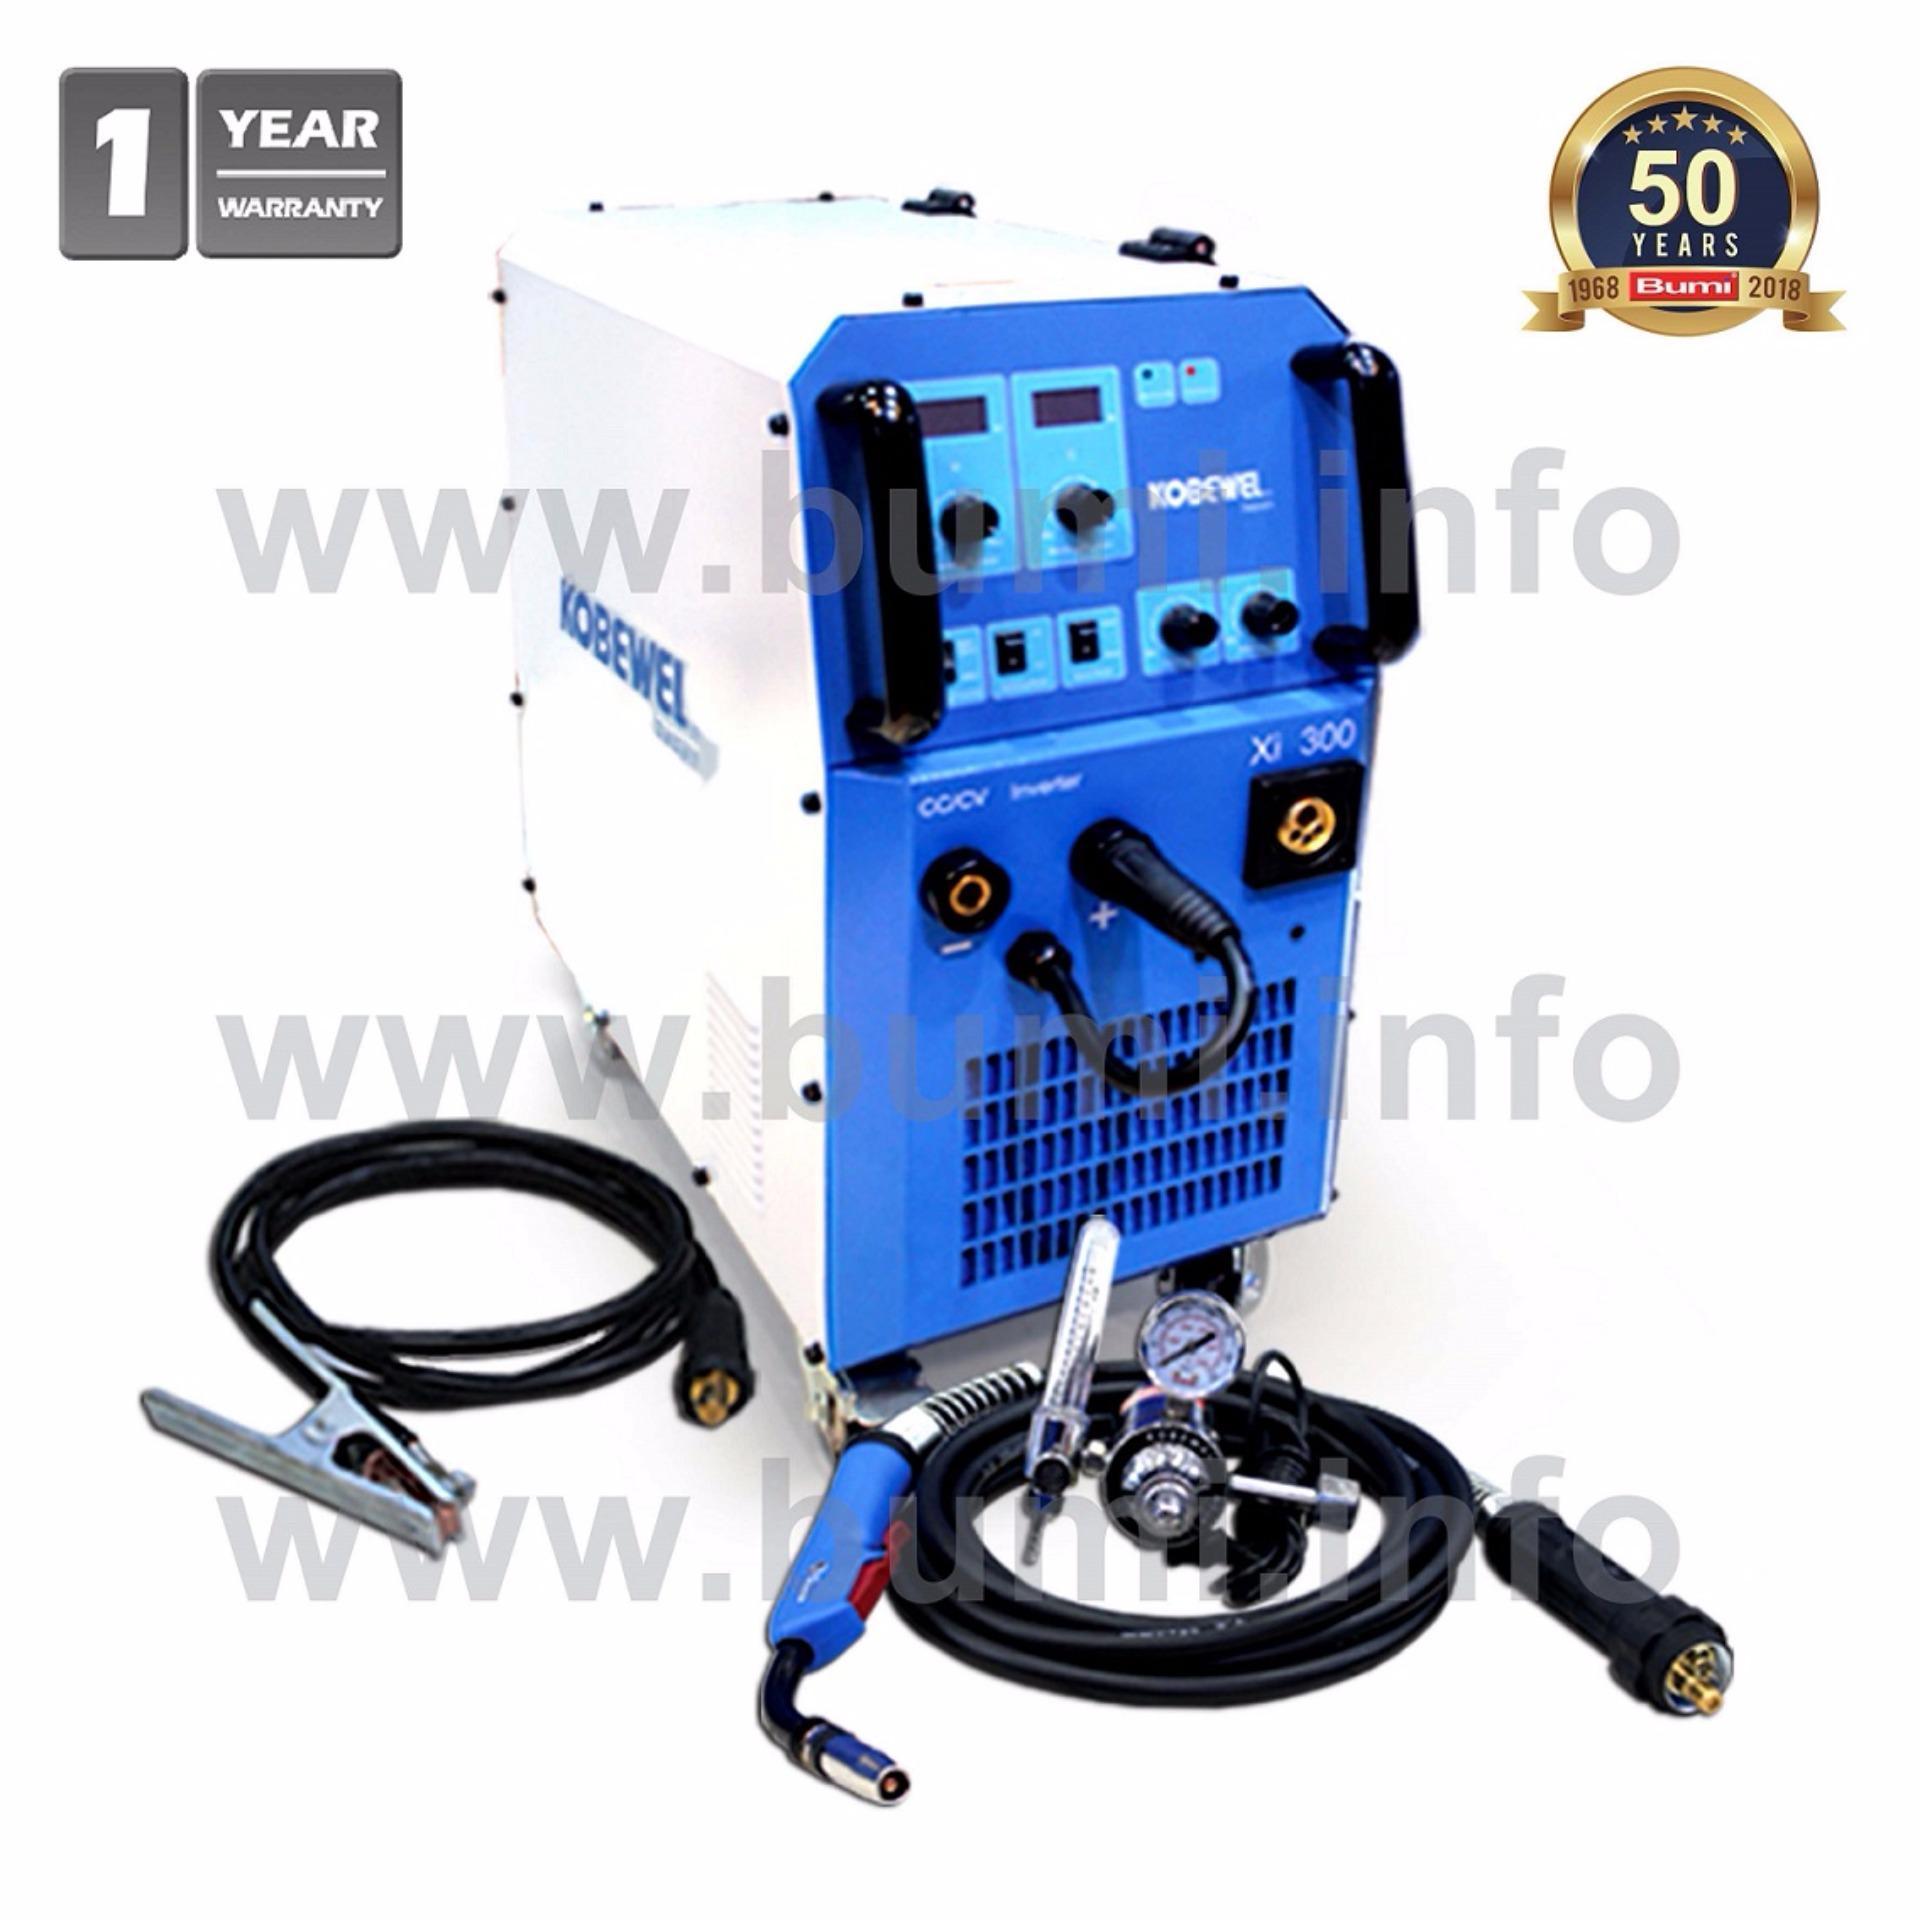 Mesin Las Inverter MIG MAG 300A - Kobewel Xi 300 - Free Helm Las